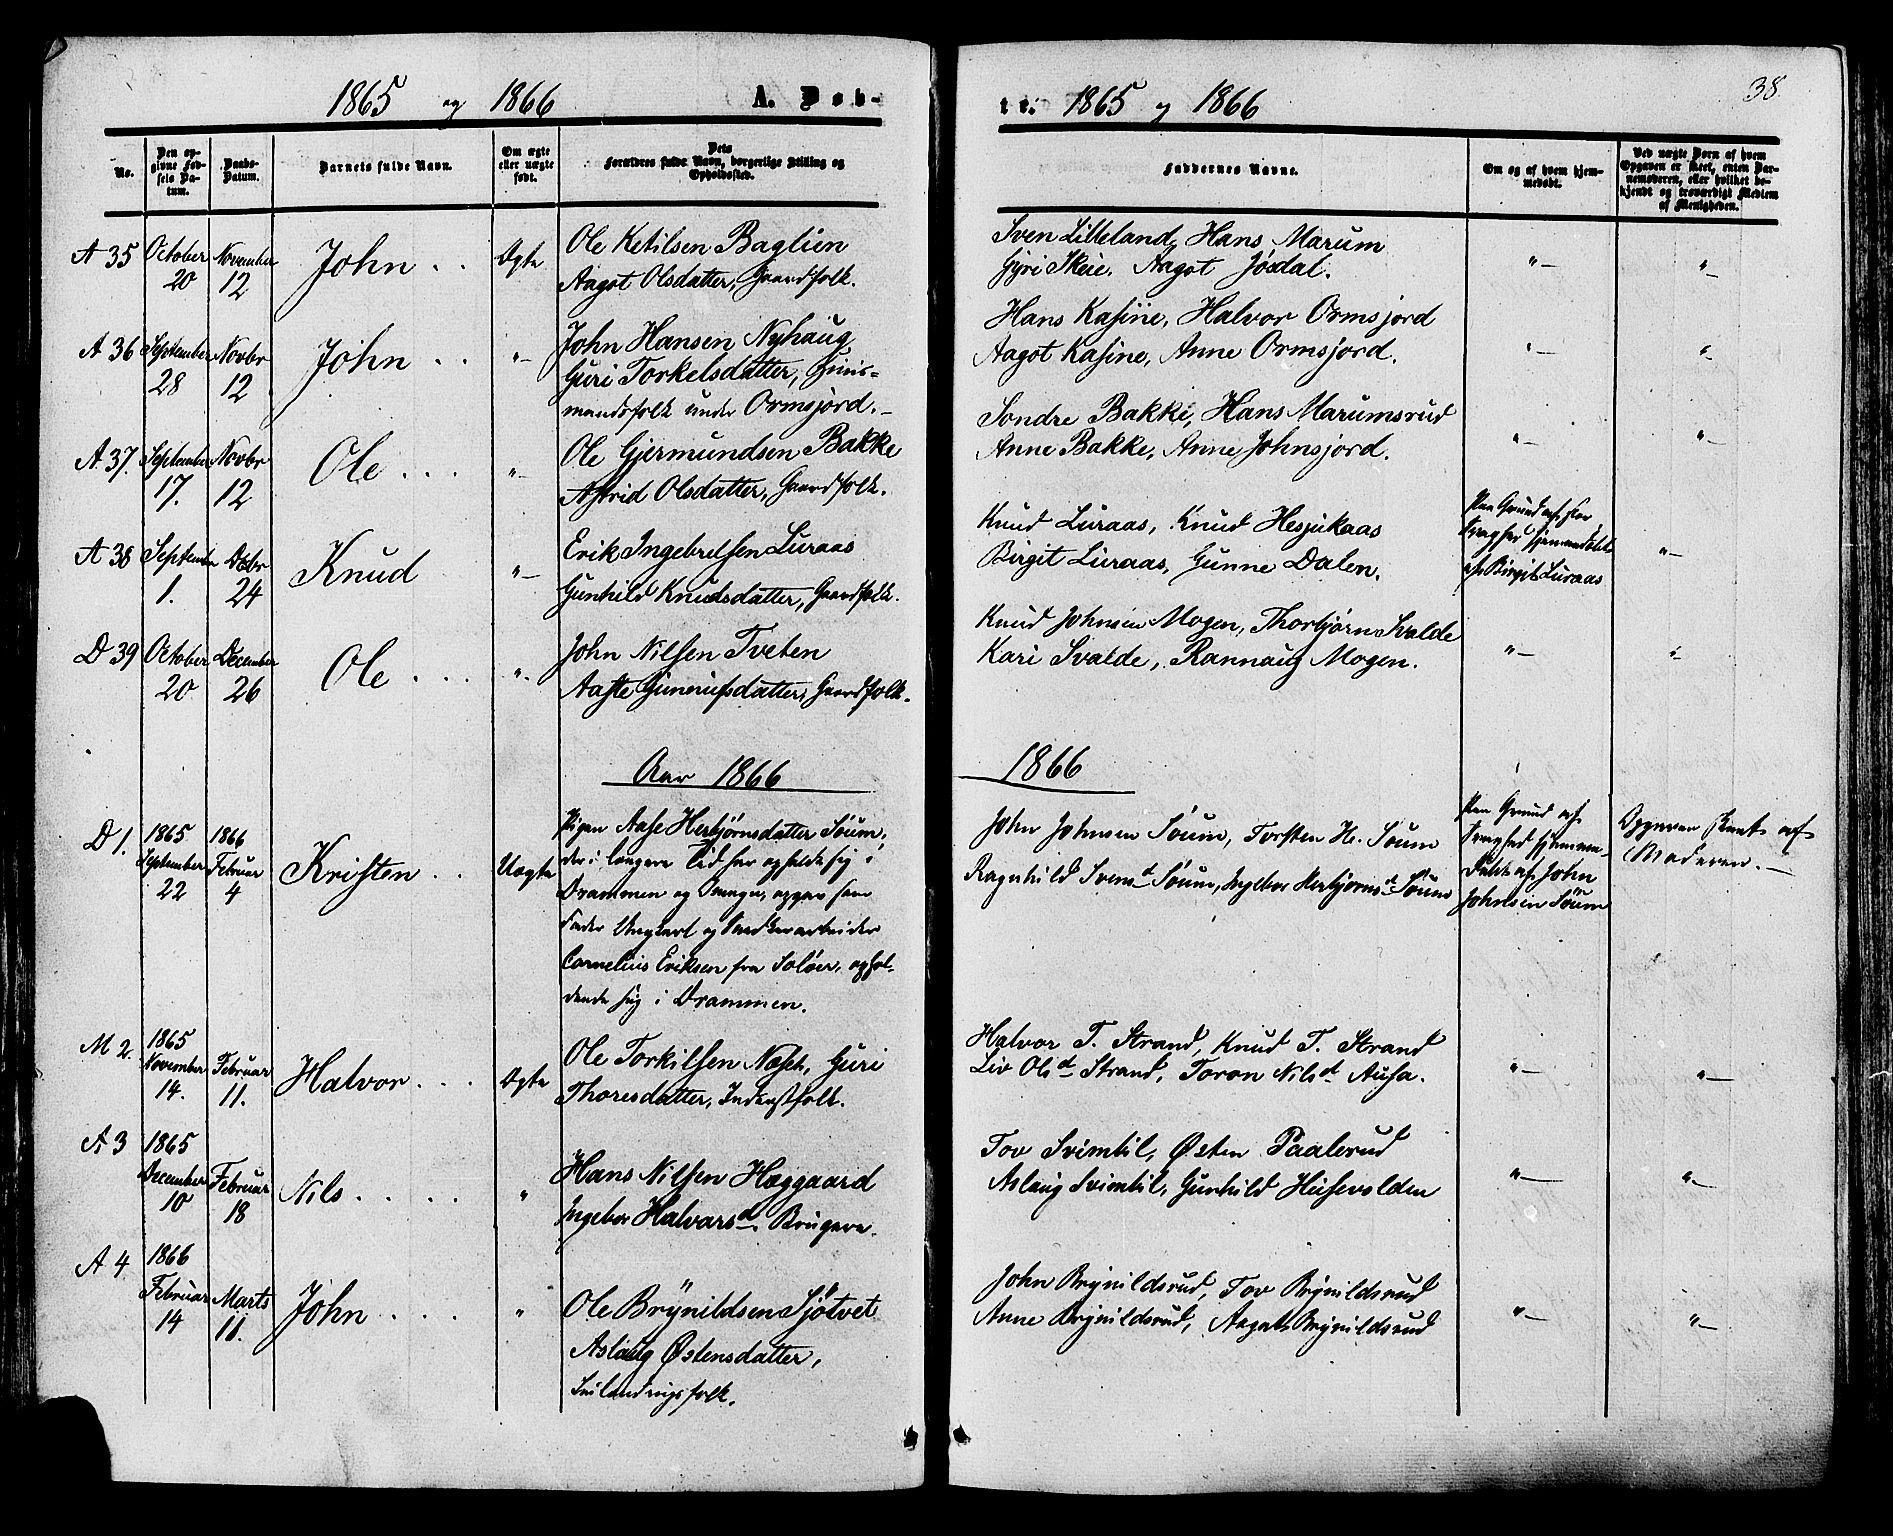 SAKO, Tinn kirkebøker, F/Fa/L0006: Ministerialbok nr. I 6, 1857-1878, s. 38